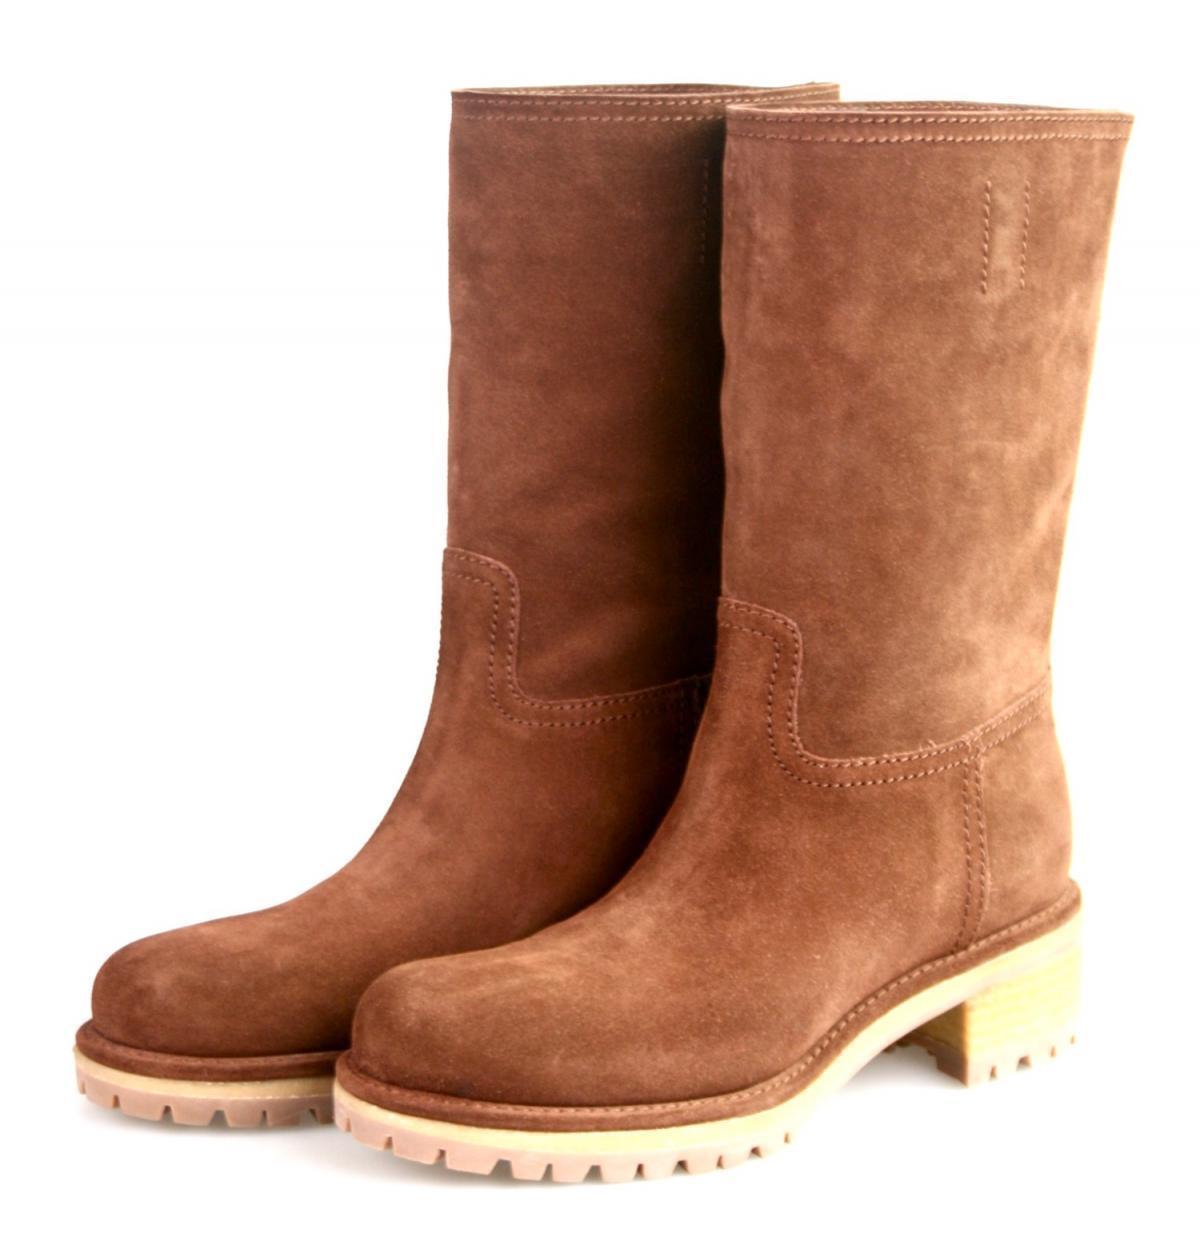 Autorización de lujo Prada media 4U5901 Zapatos bota de gamuza gamuza gamuza marrón nuevo 41 41,5 Reino Unido 8  ventas en linea